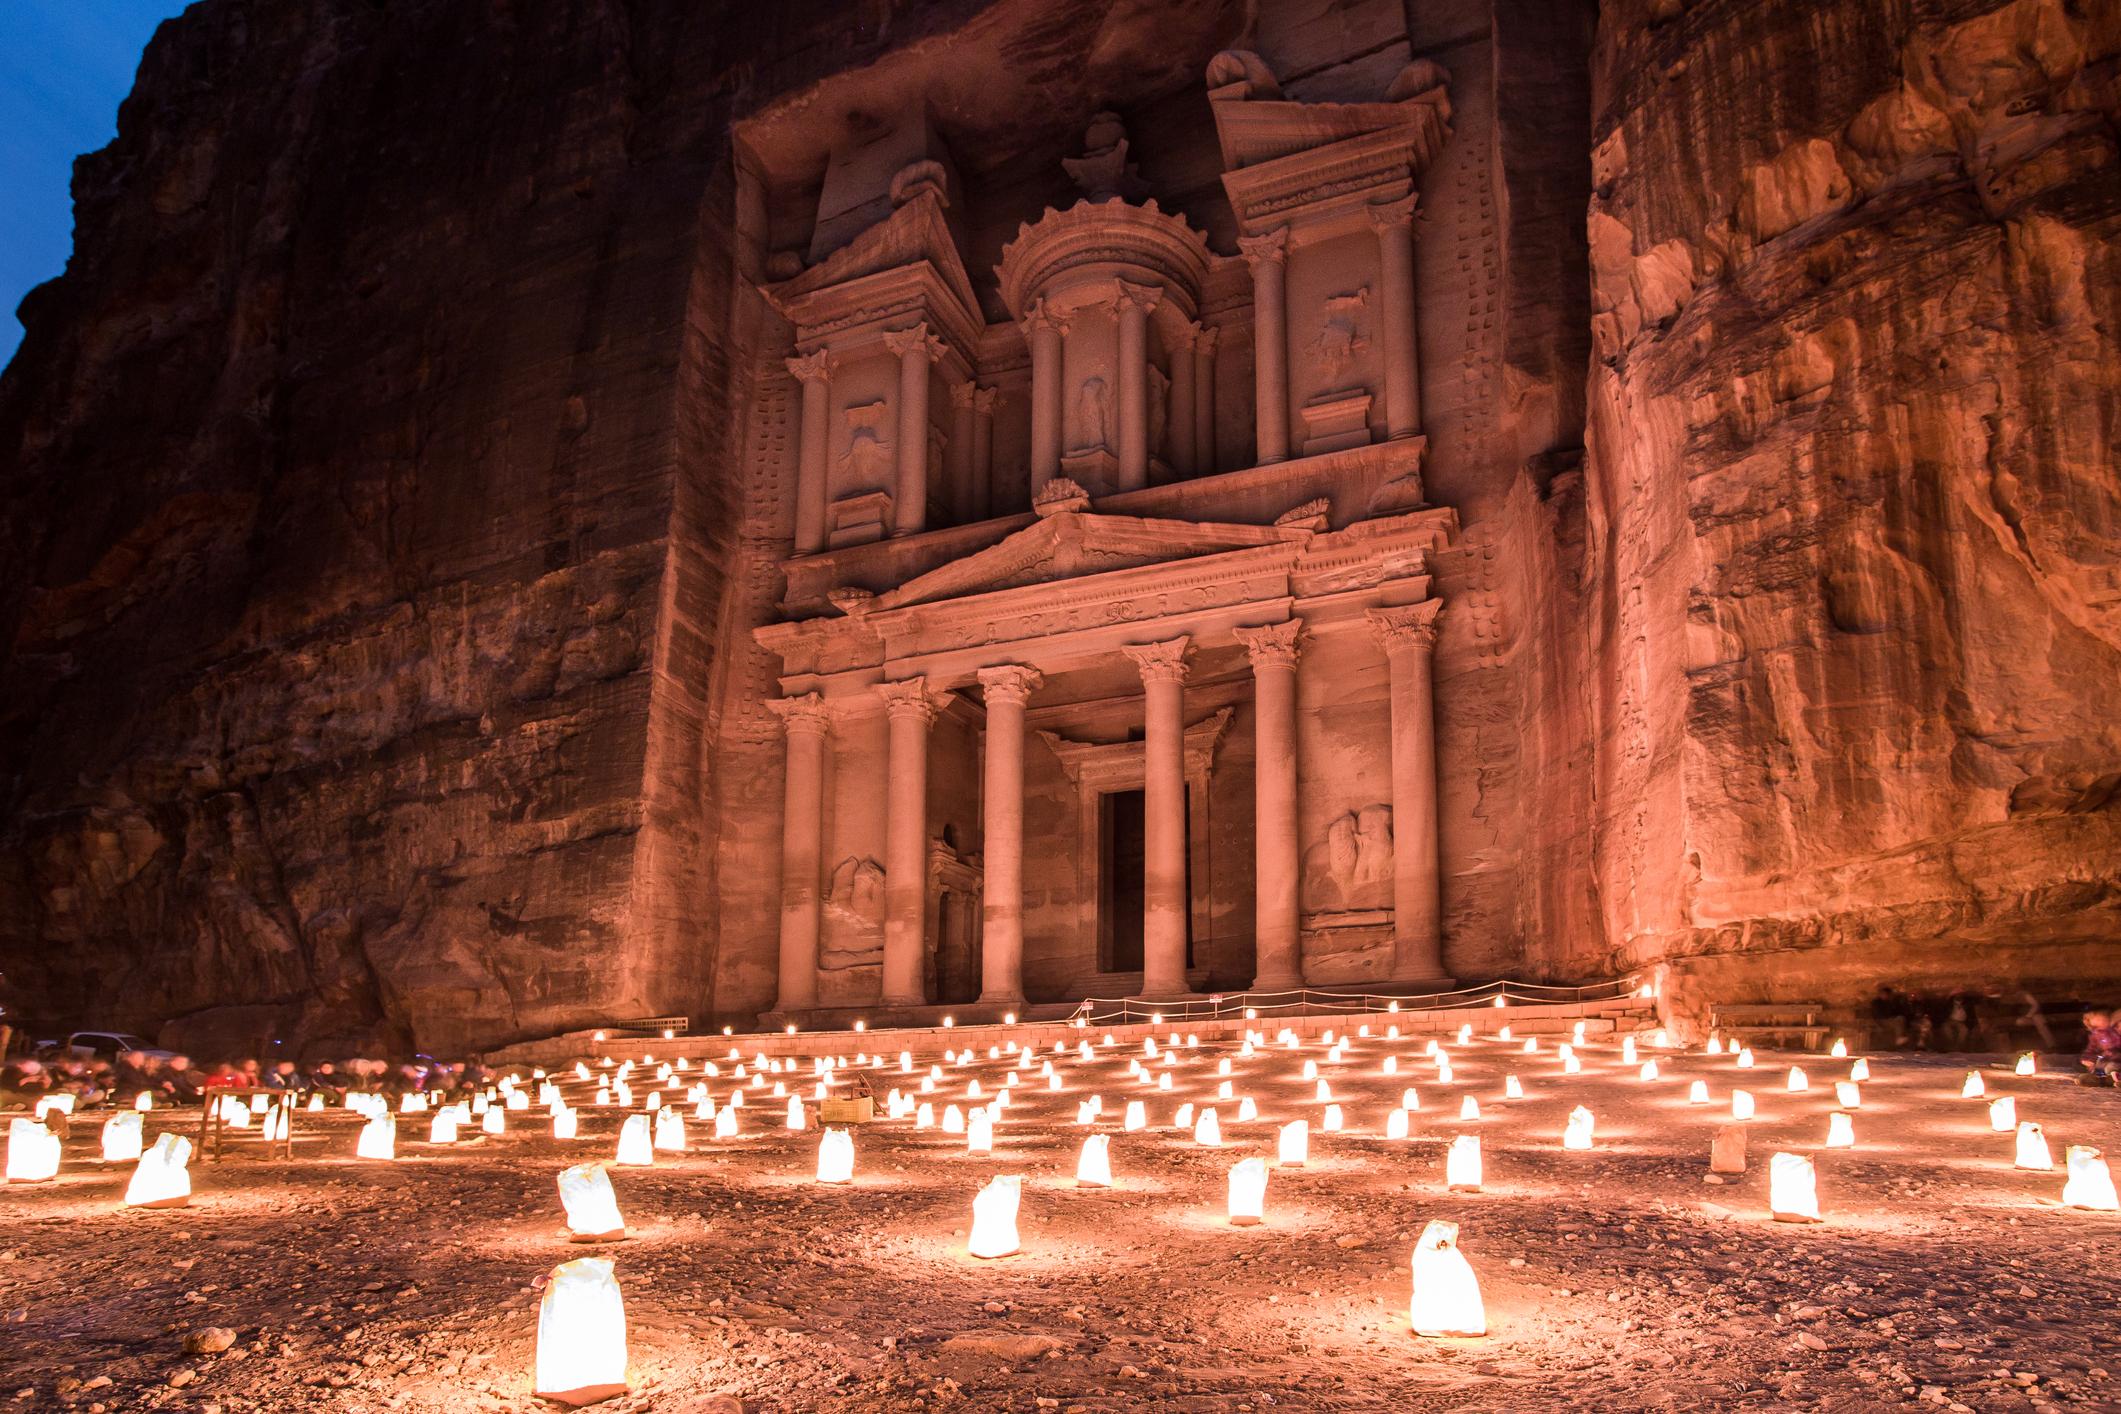 Jordan: A desert paradise